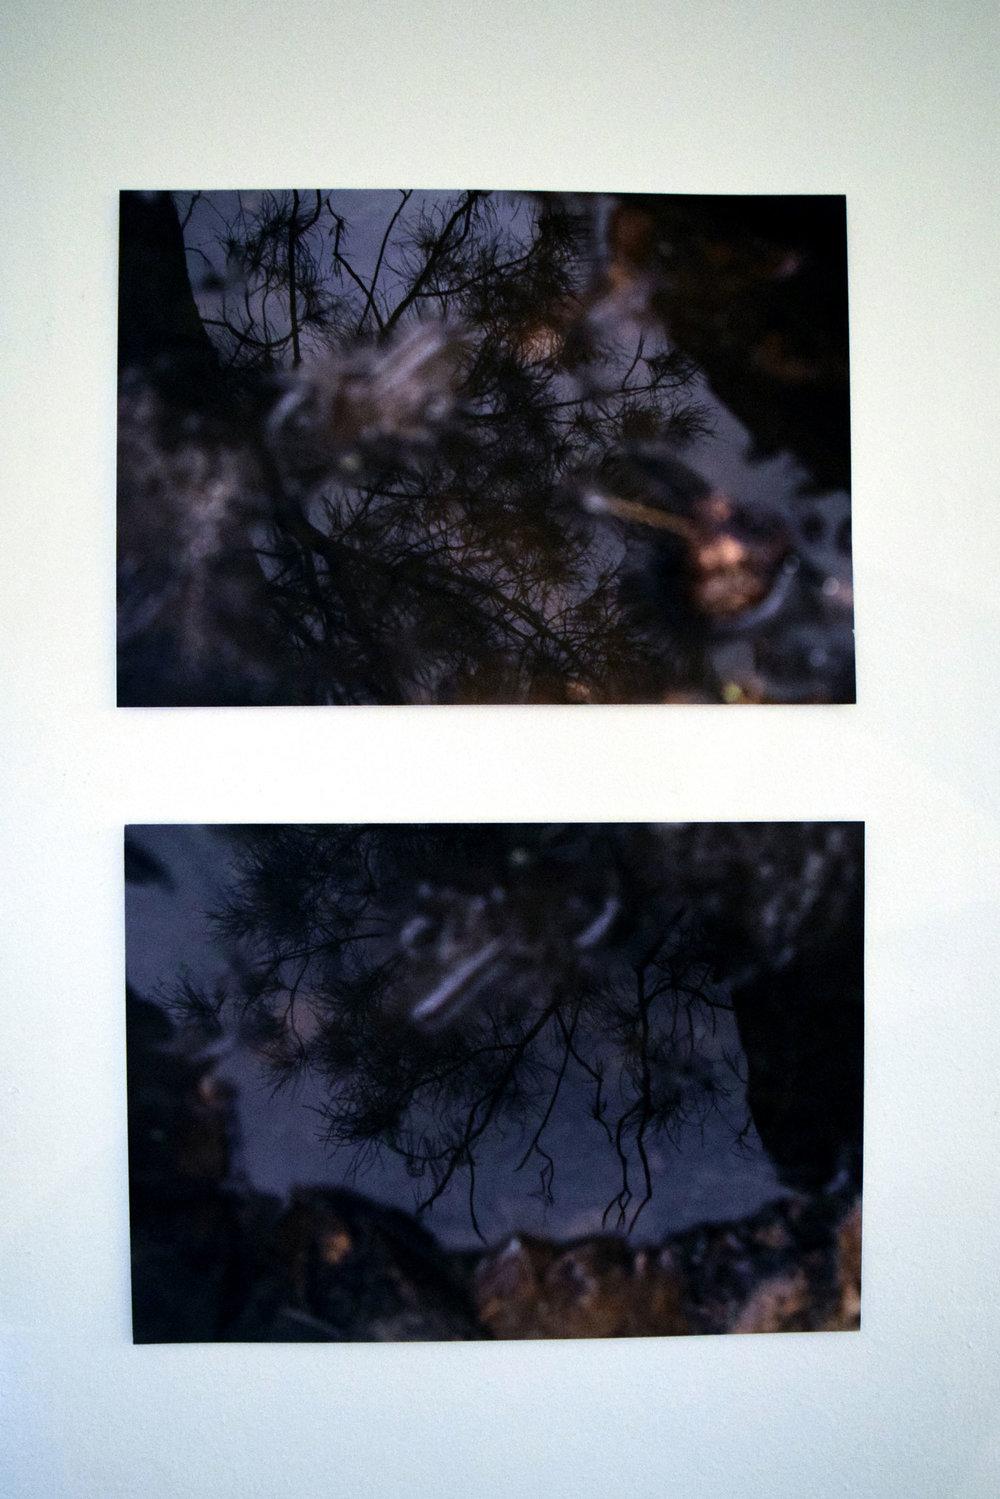 14 Bina Butcher, Resonate, 2018, Digital Prints, set of 2, $160